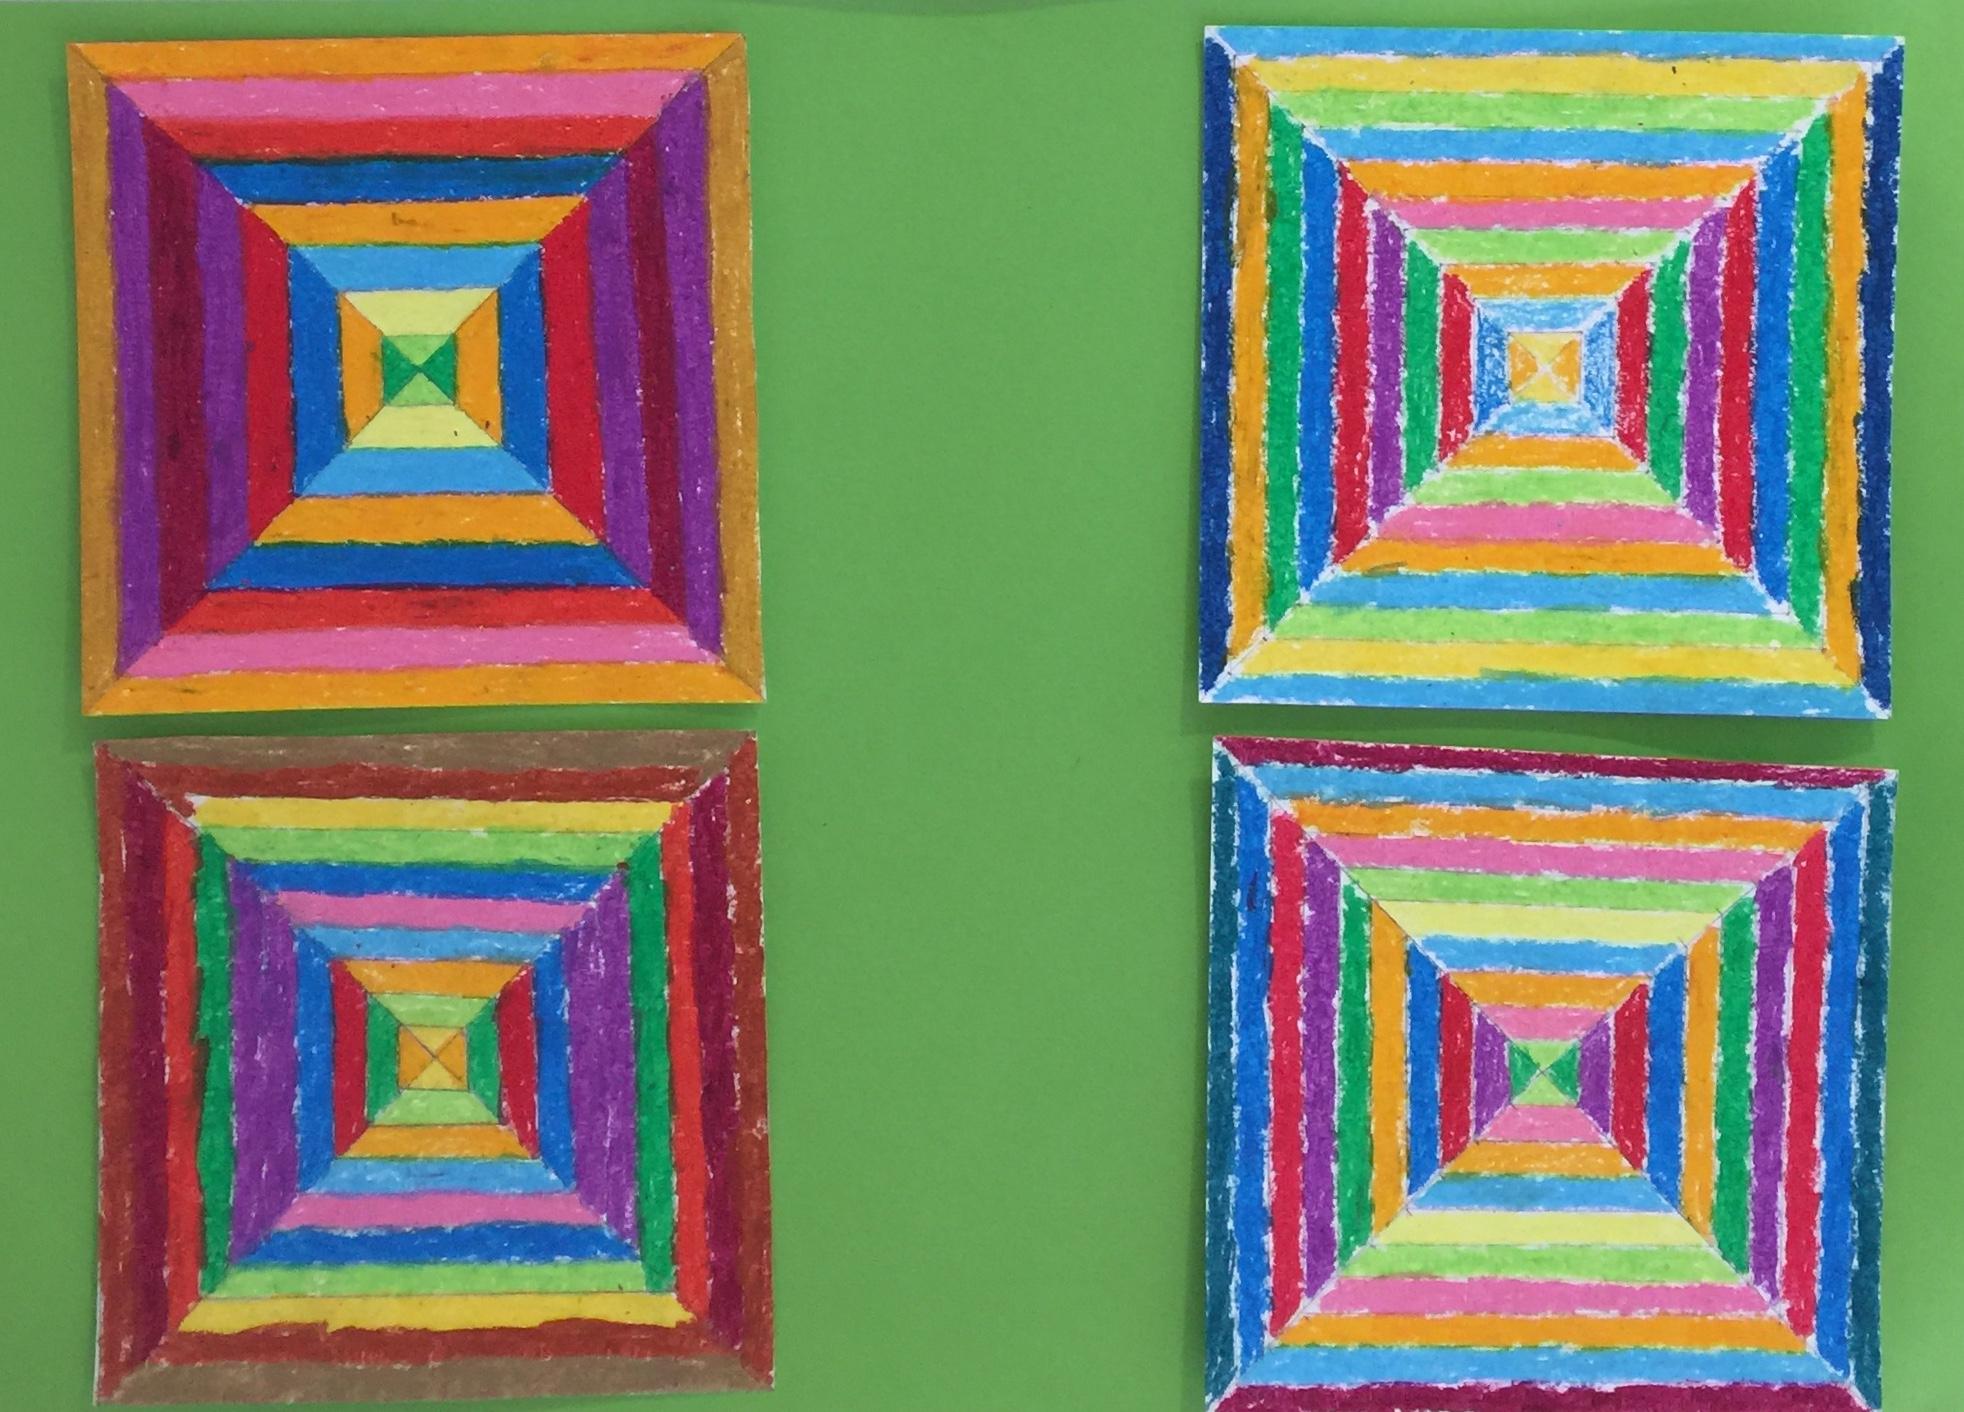 Un An D'arts Plastiques En Segpa (Ou Cycle Iii) - Charivari destiné Arts Visuels Symétrie